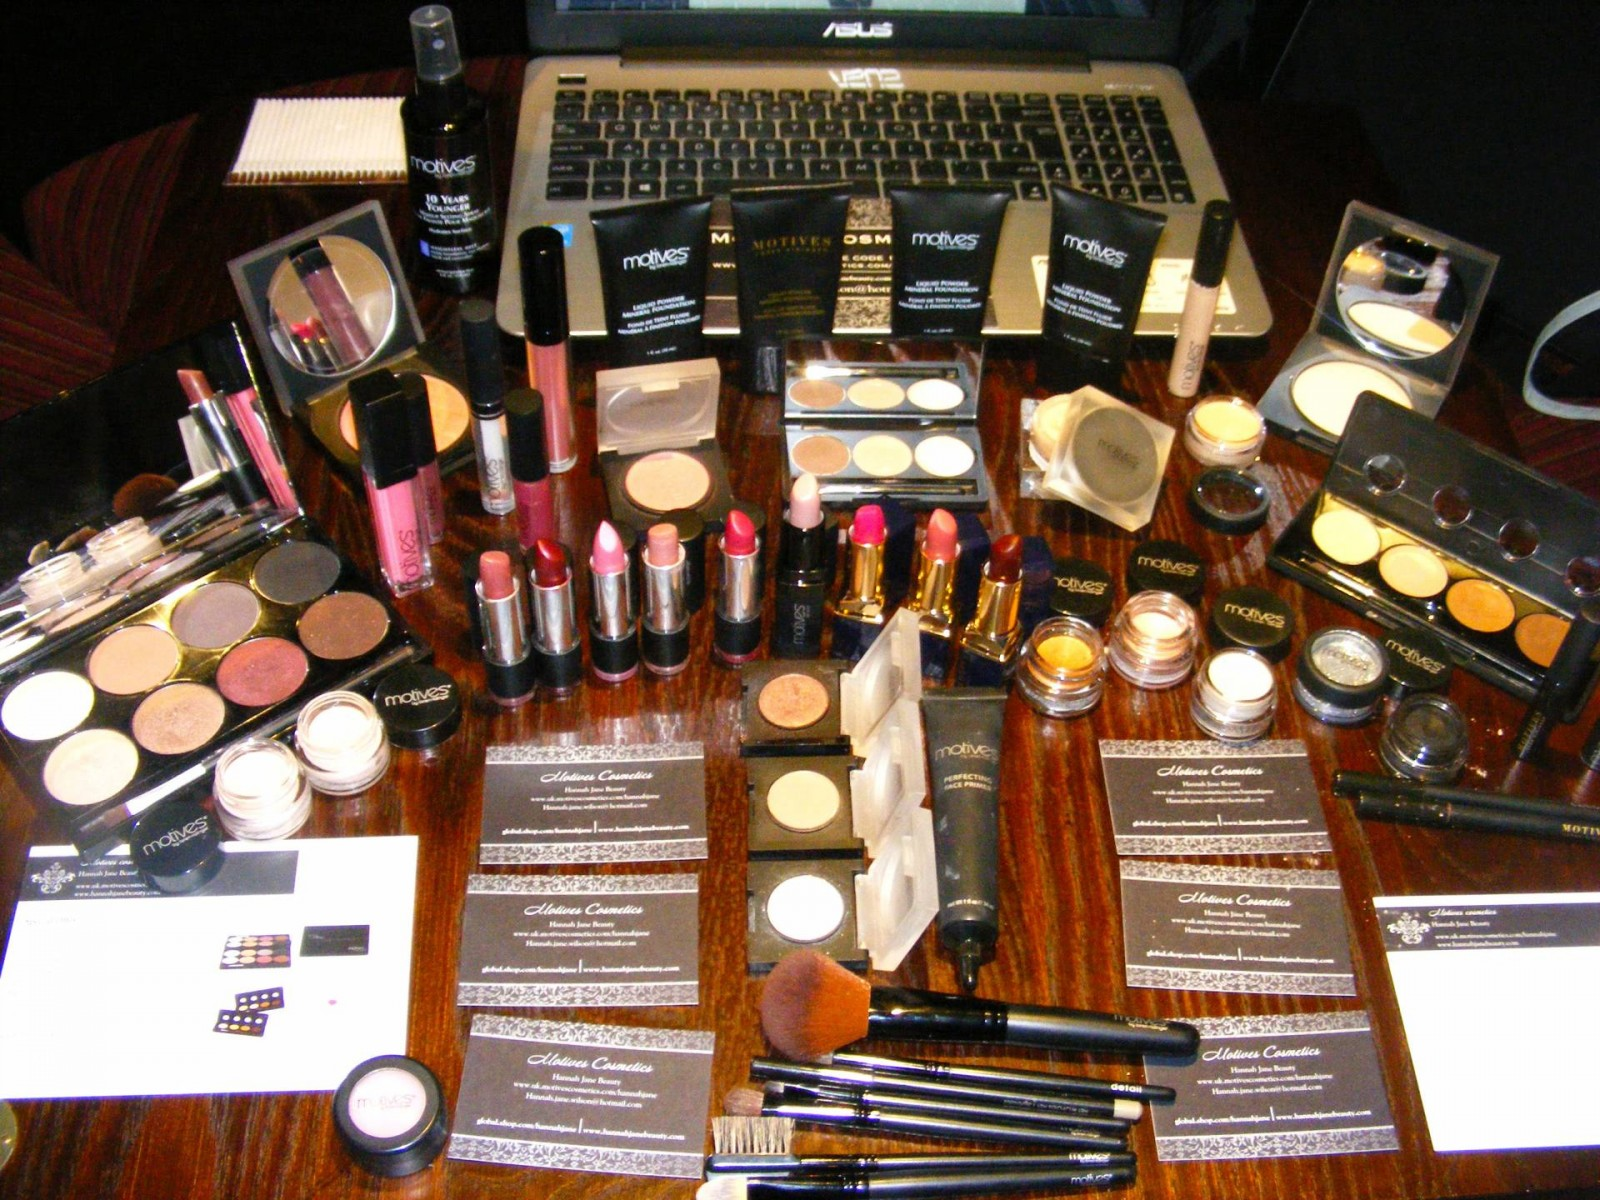 Motives cosmetics stand